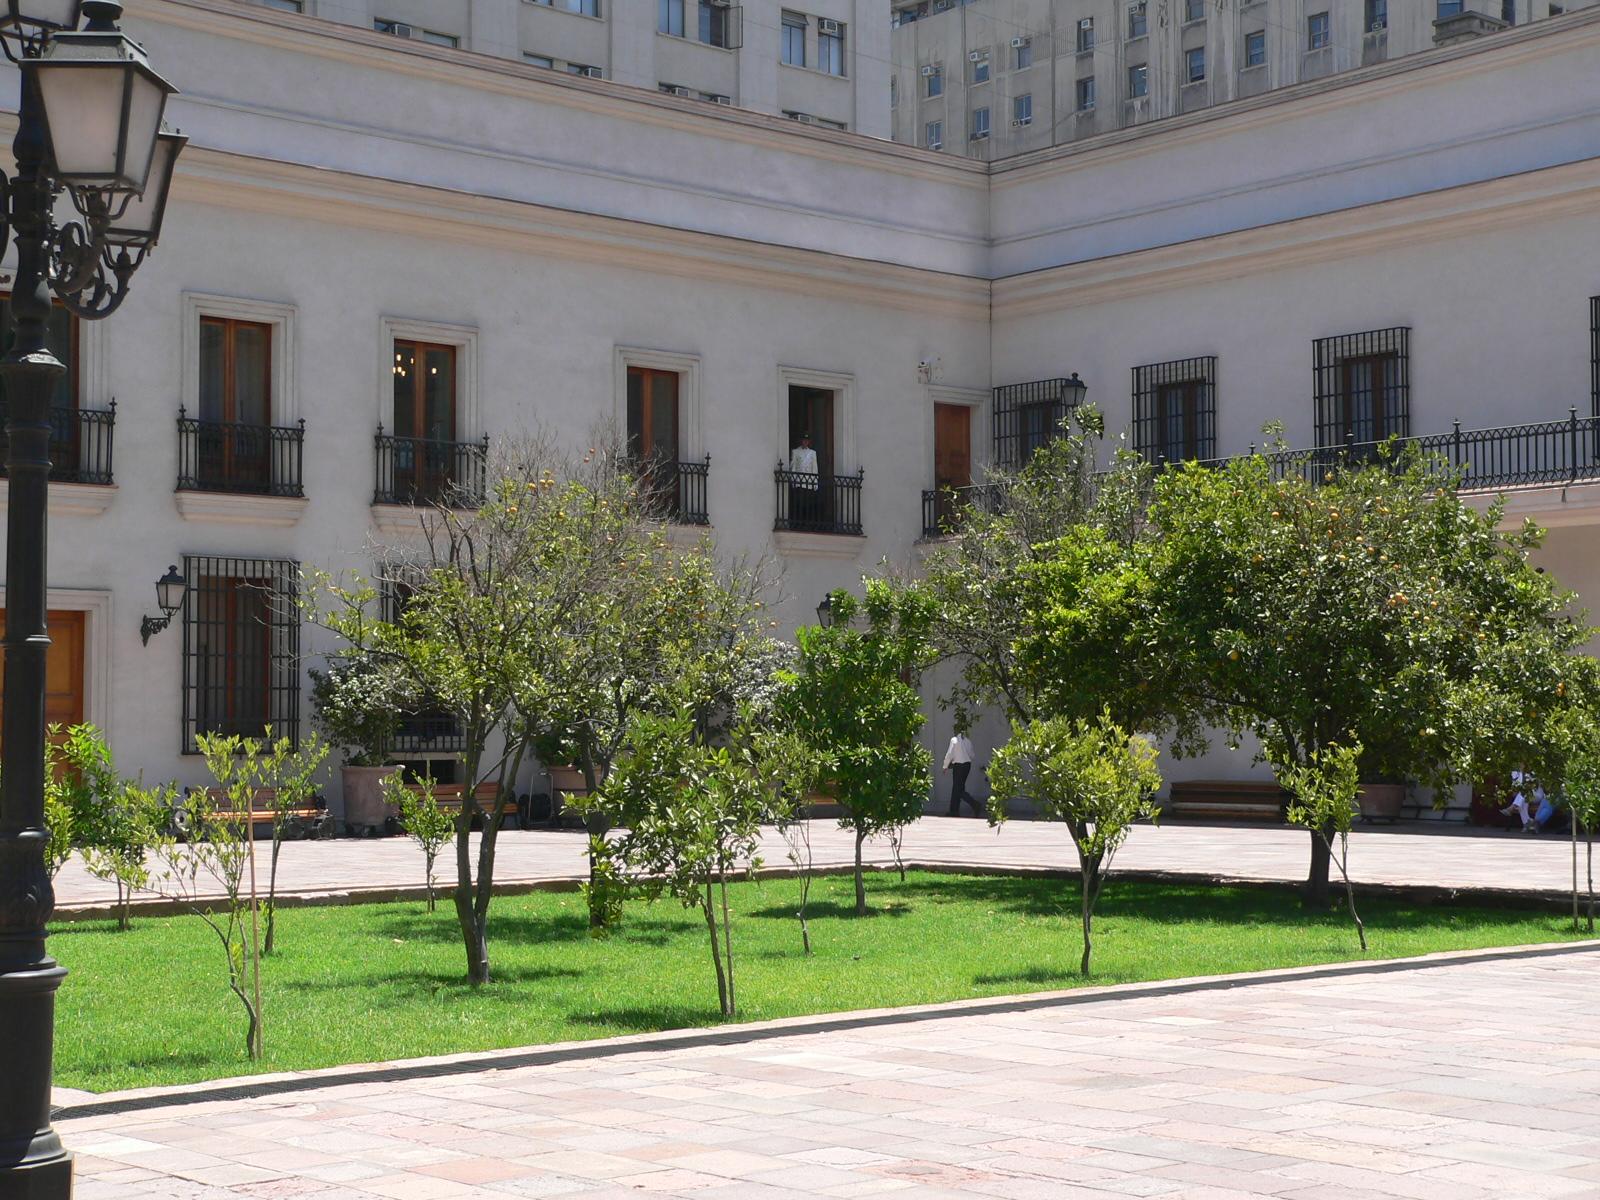 File:La Moneda-Patio de los Naranjos.jpg - Wikimedia Commons